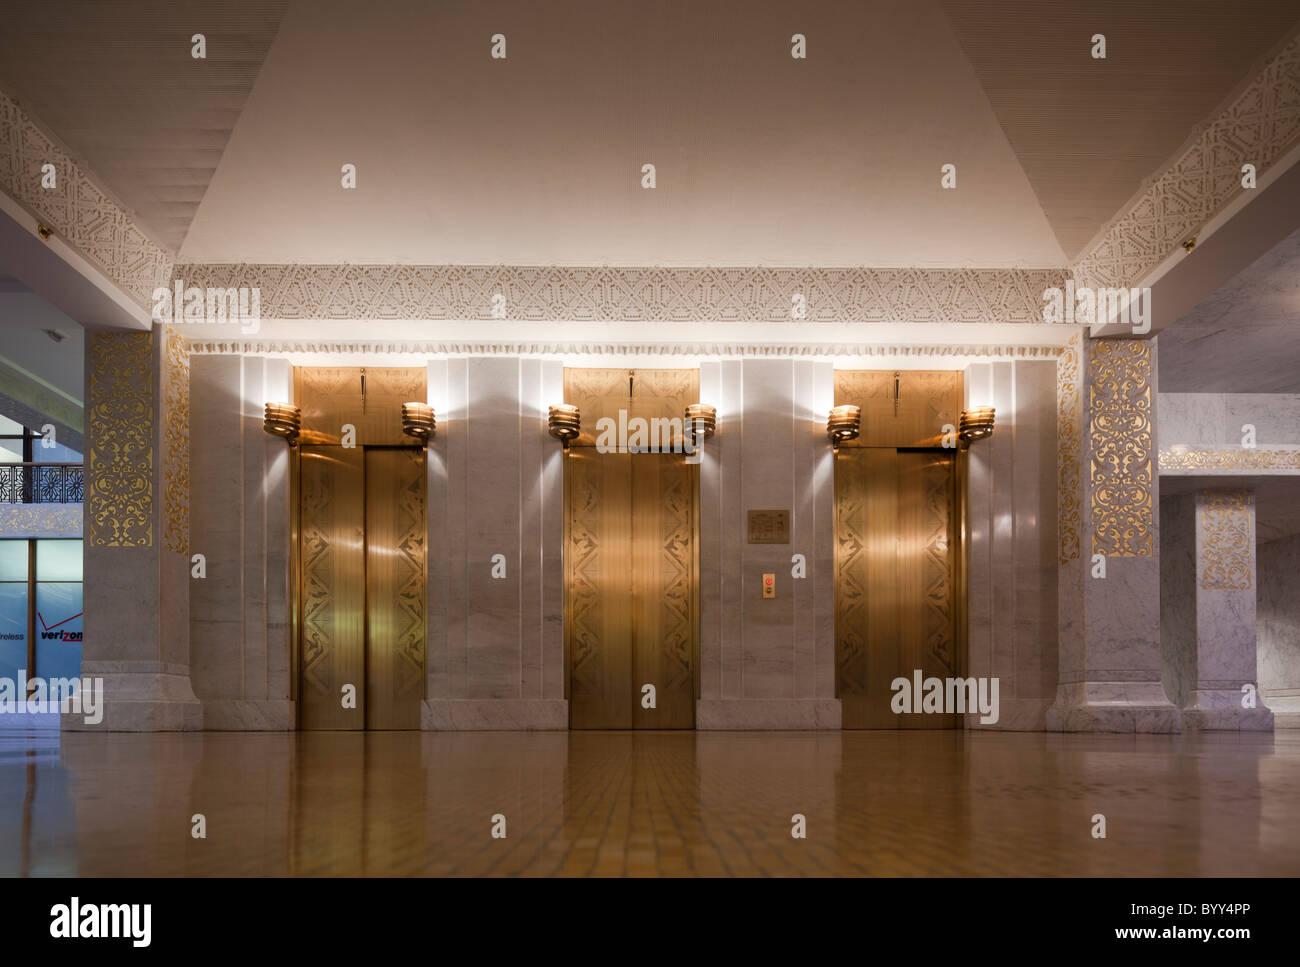 interior of the Rookery, 209 South LaSalle Street, Chicago, Illinois, USA Stock Photo